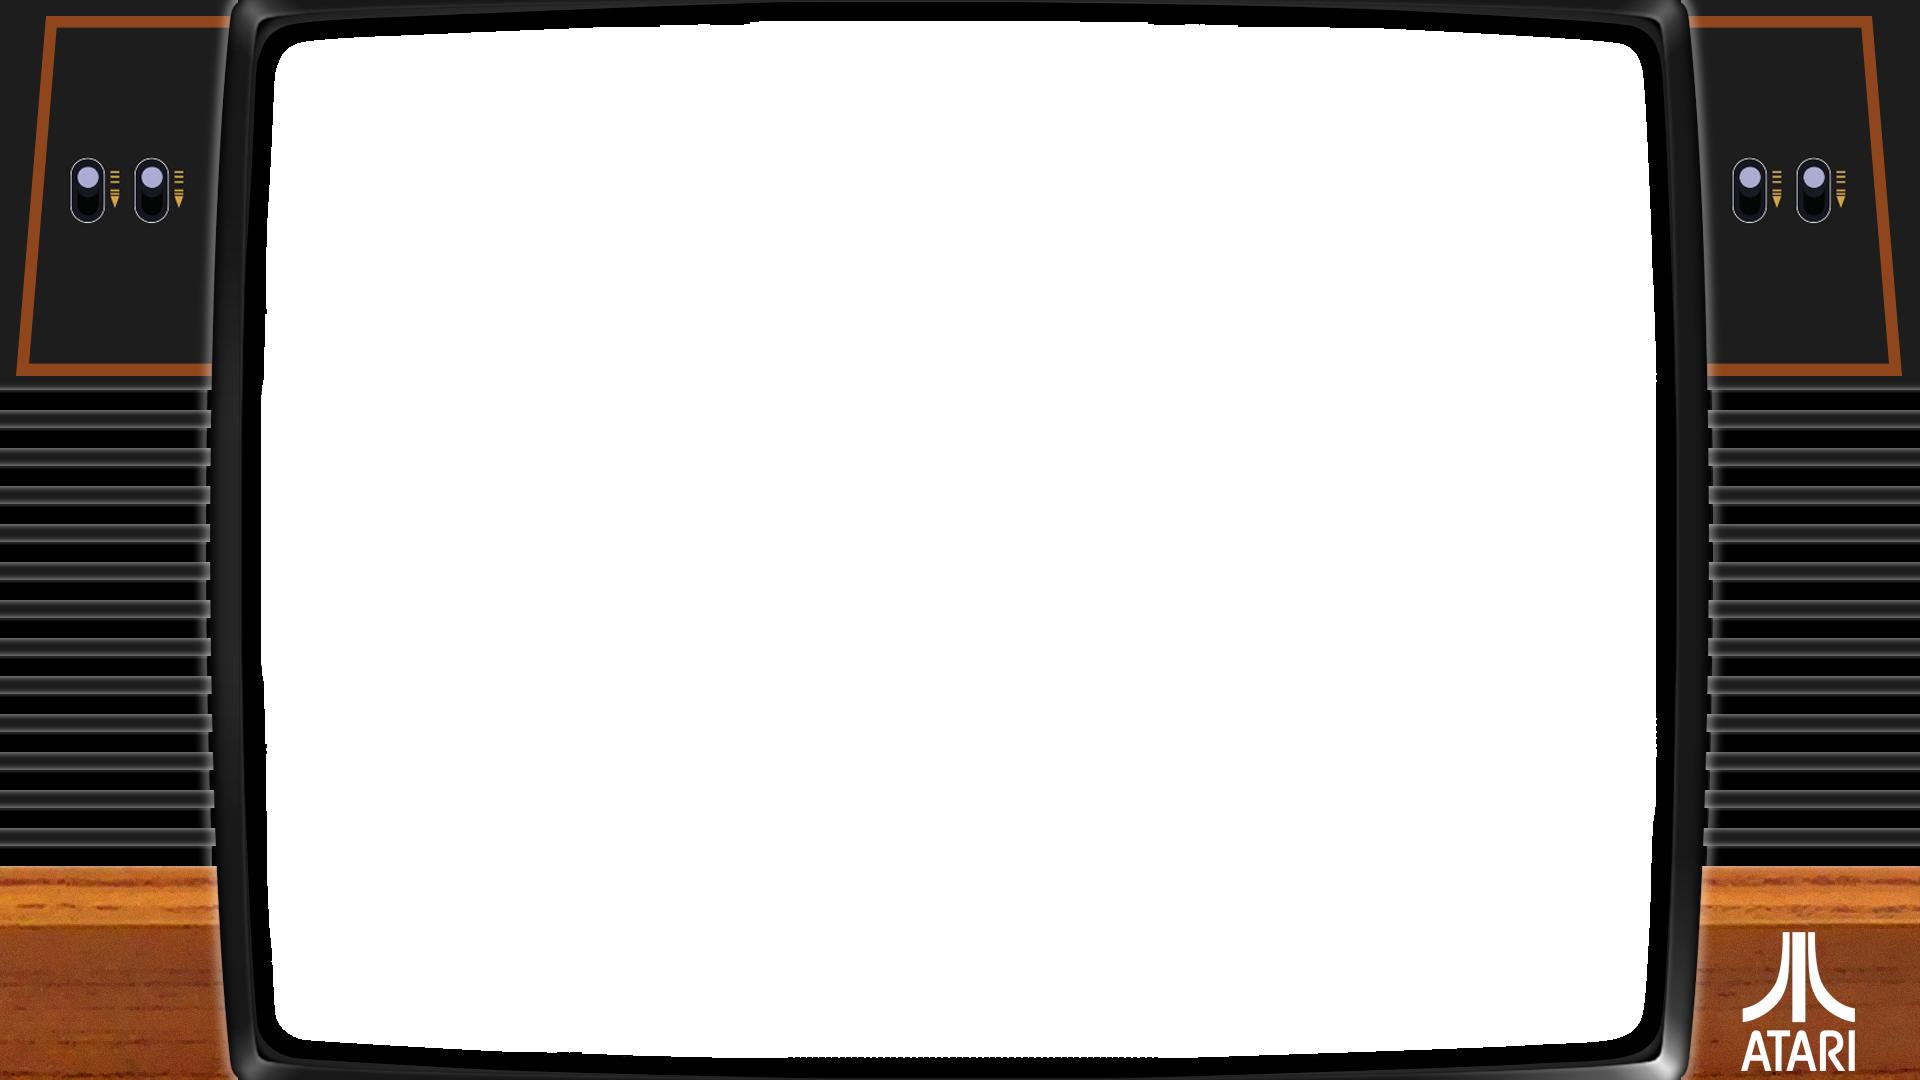 GitHub - gallyg/zover4recalbox: ZOVER4RECALBOX Collection - Packs